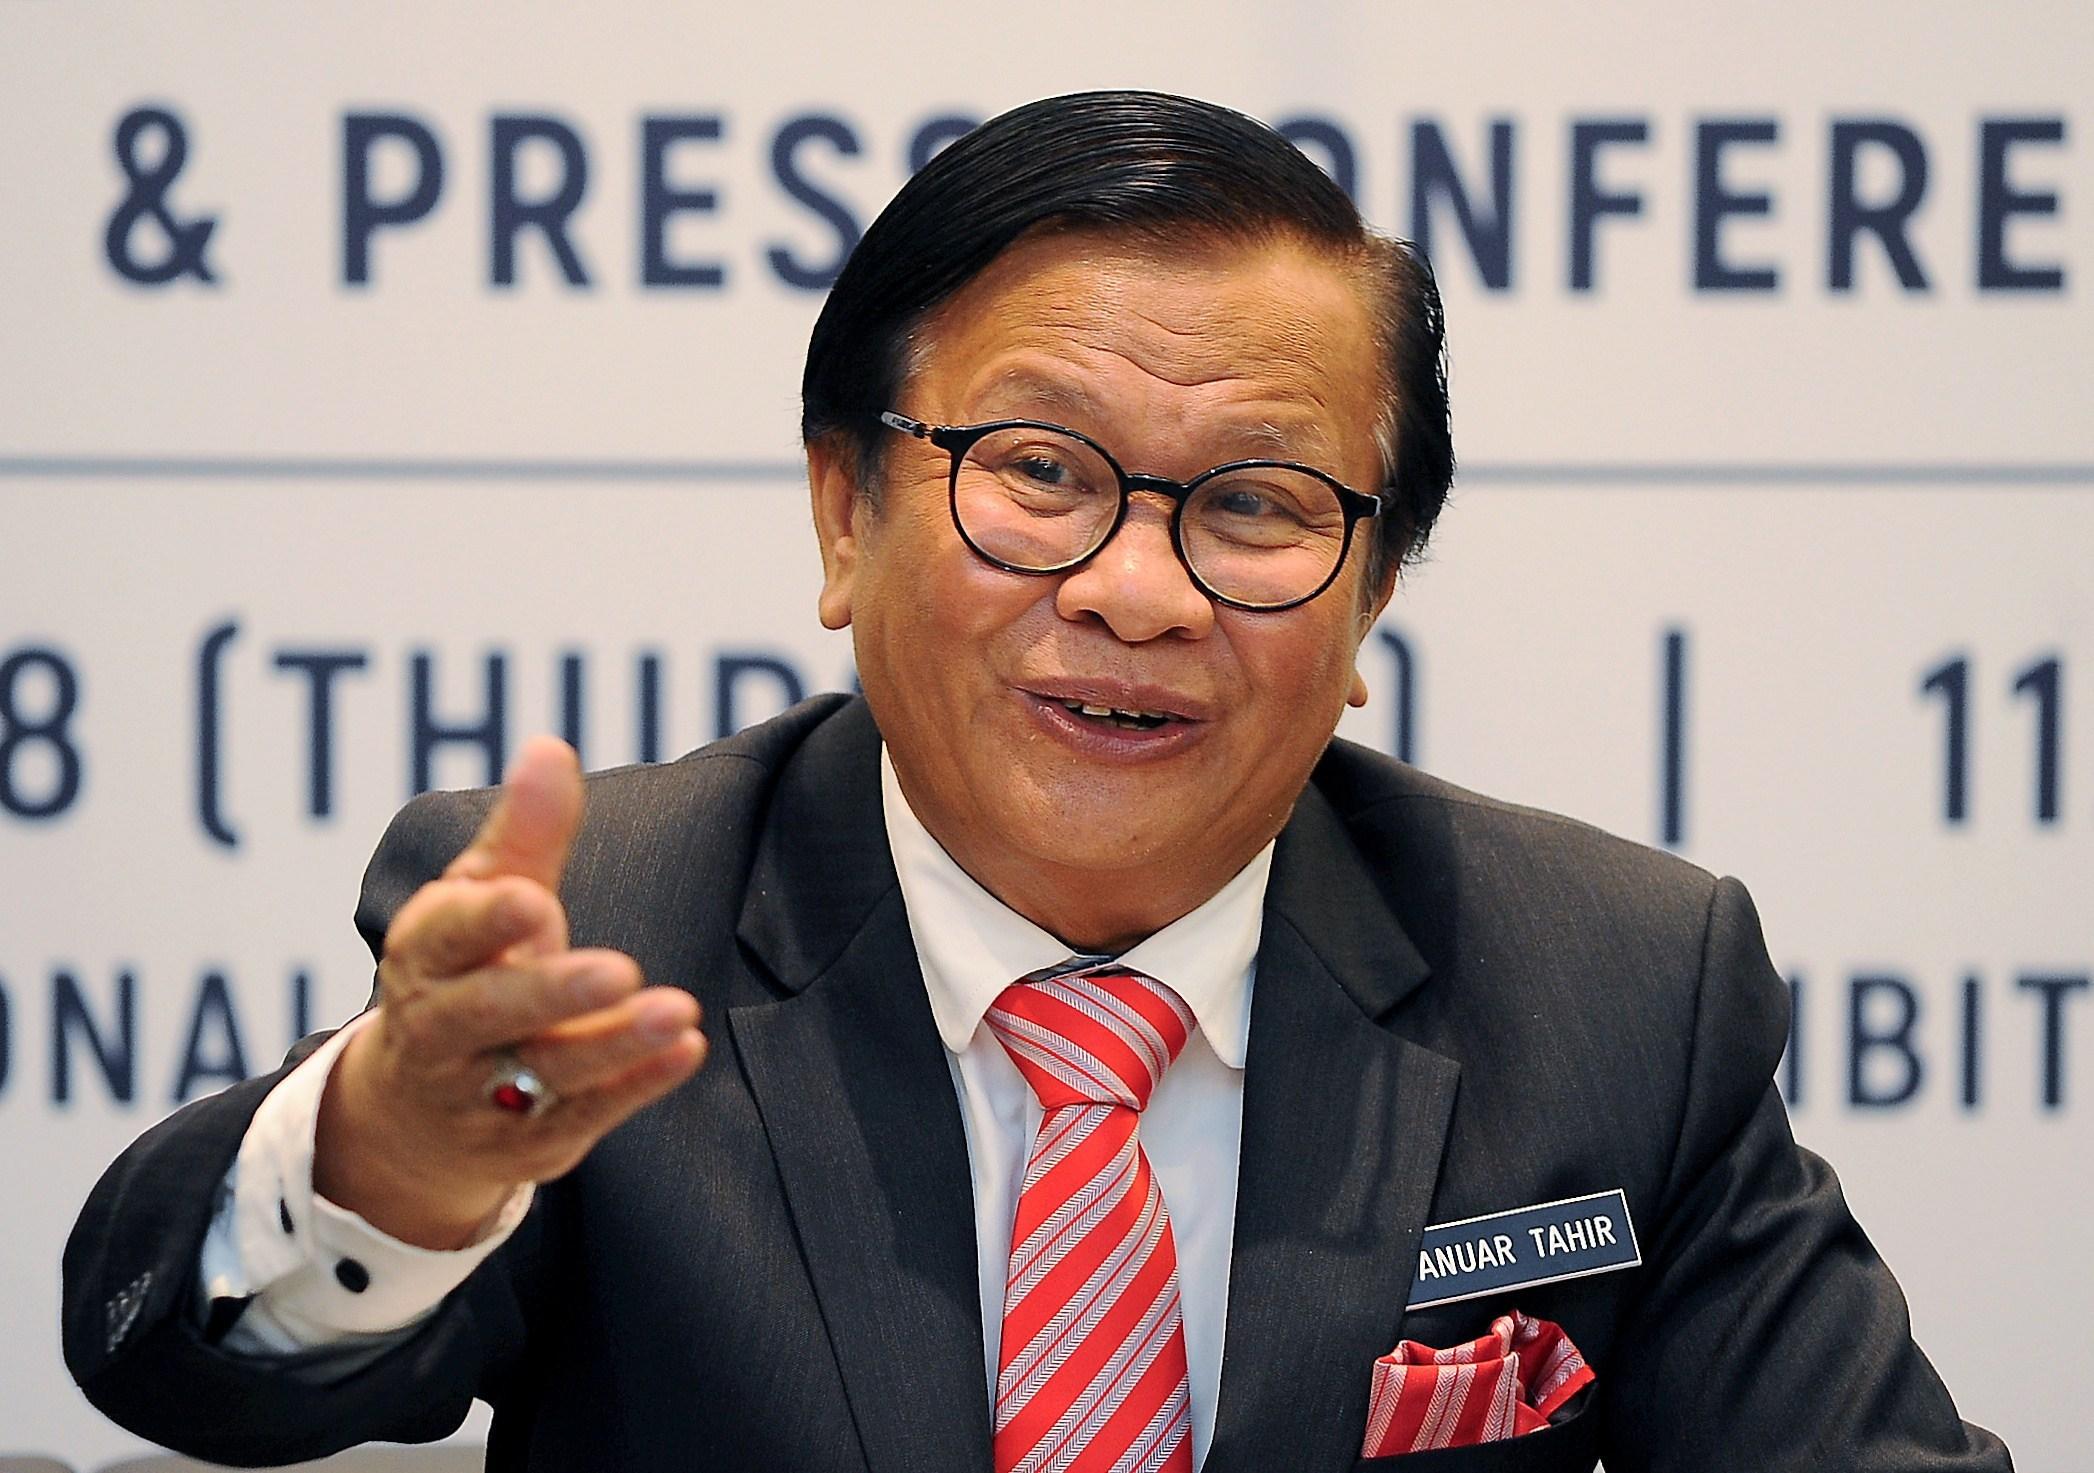 Image from Timbalan Menteri Kerja Raya, Mohd Anuar Tahir